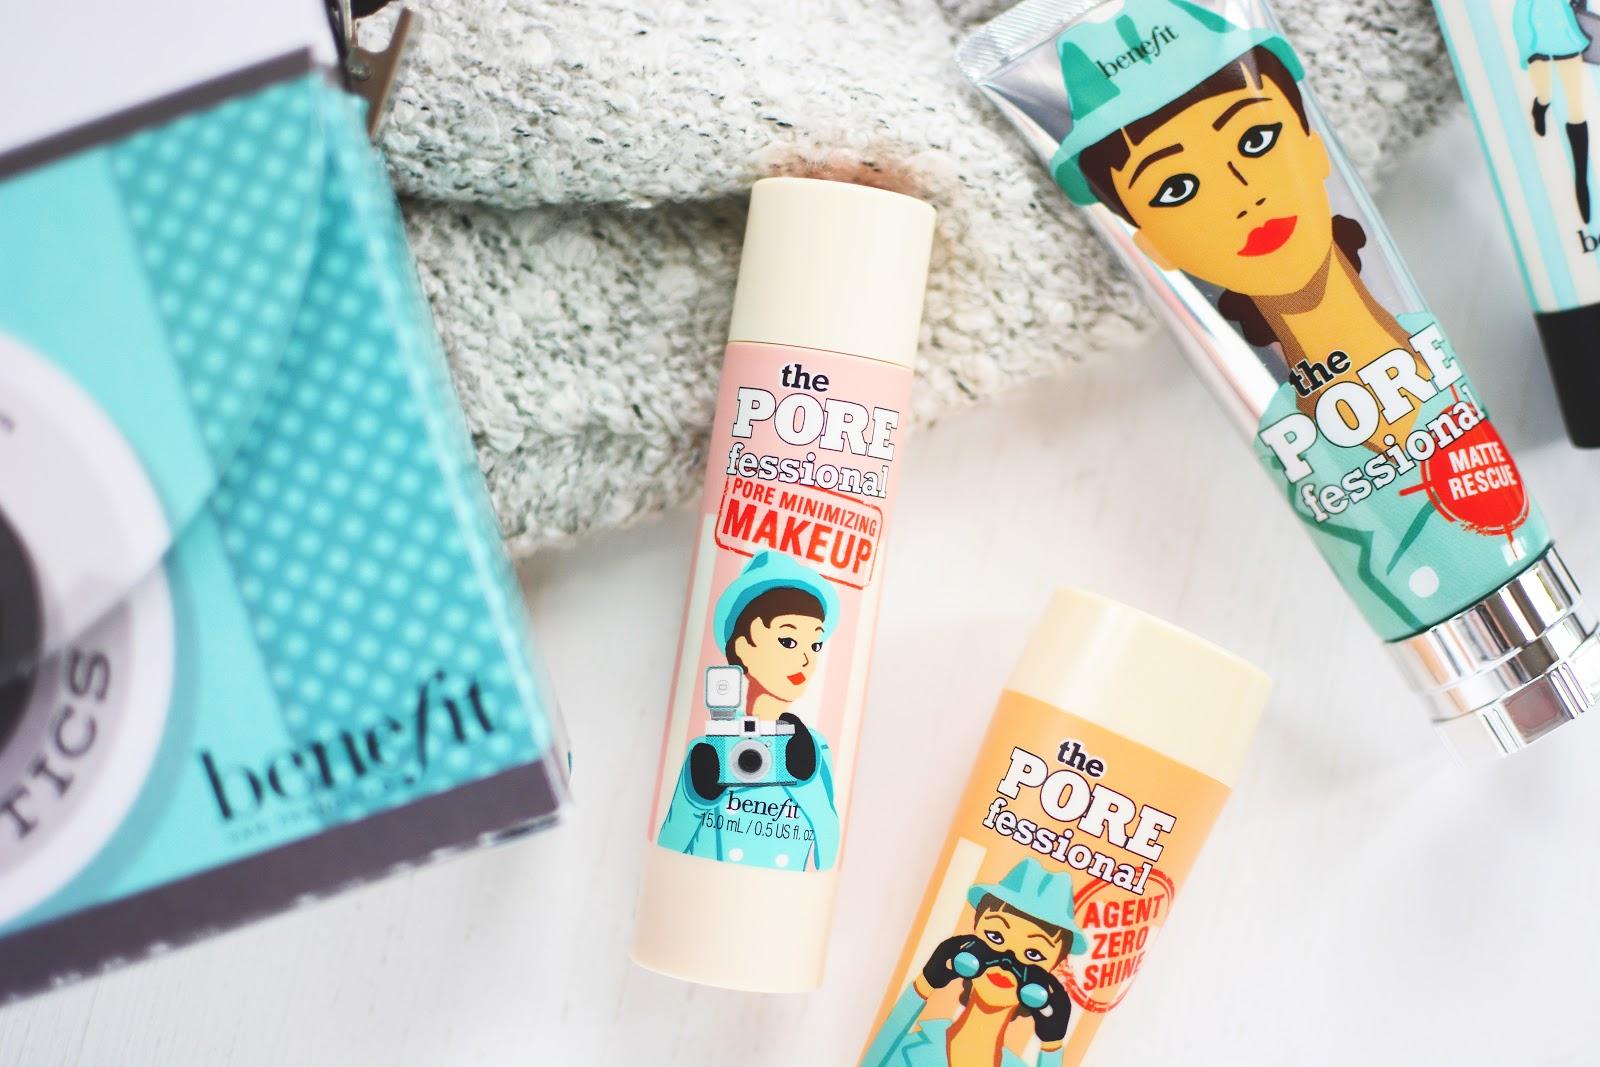 Benefit Cosmetics Pore Minimizing Make-Up